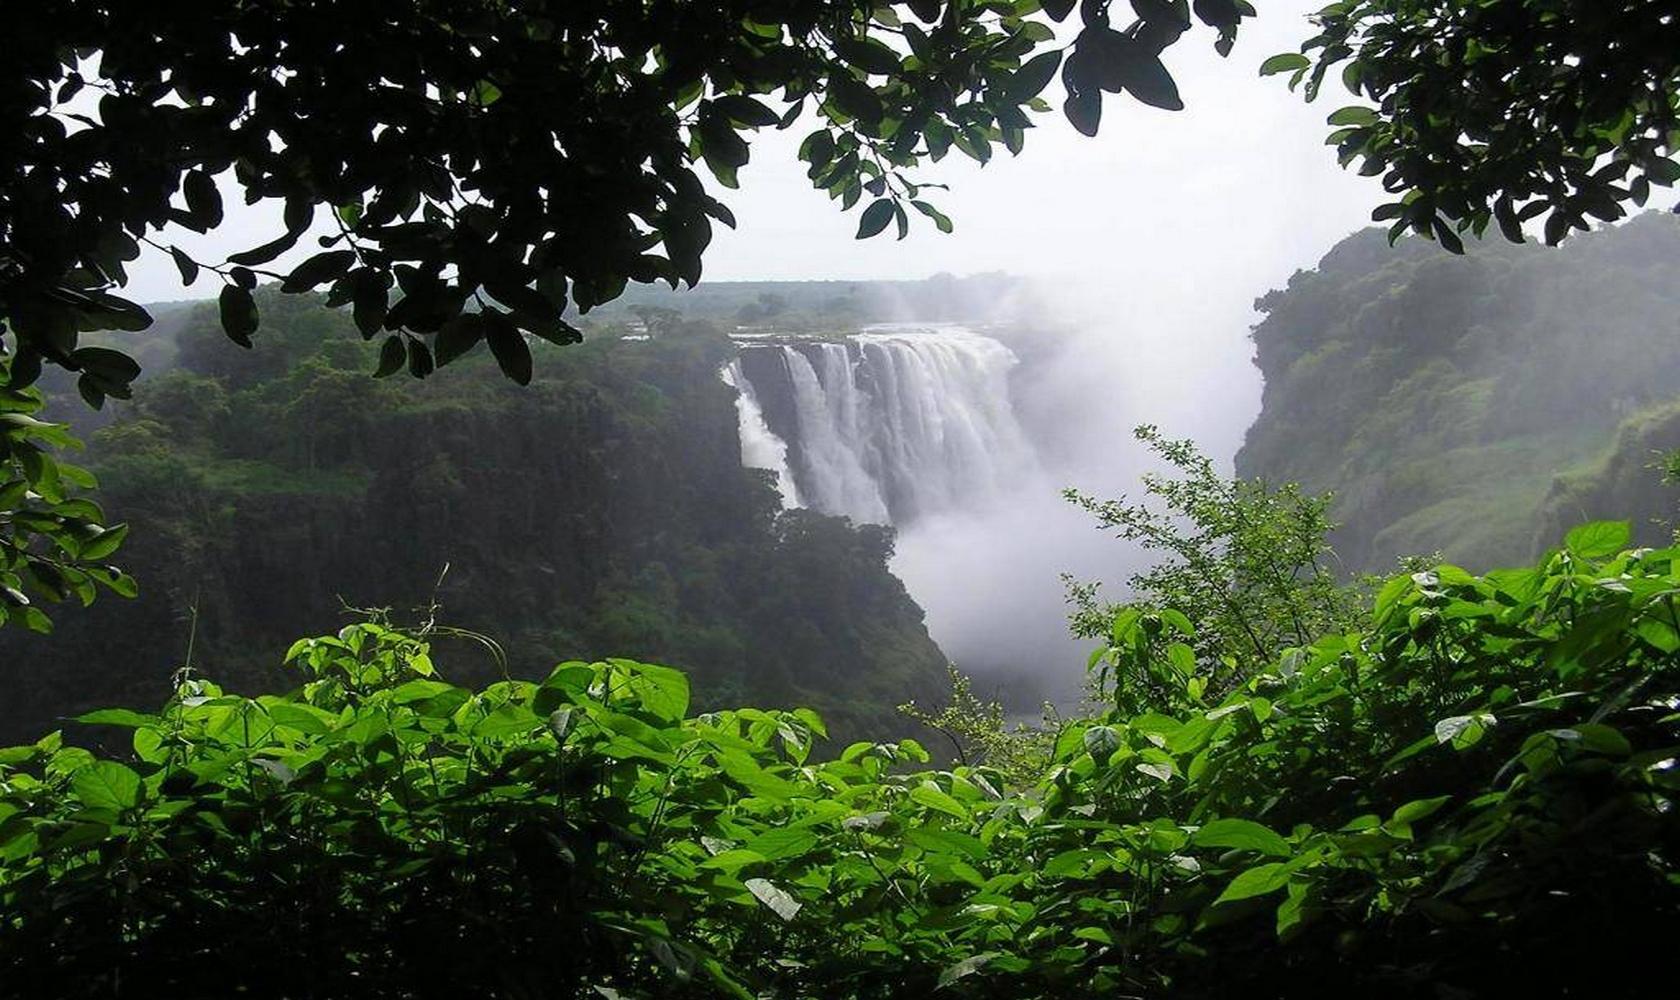 Africa_Chutes_Victoria_009-1680-1000.jpg